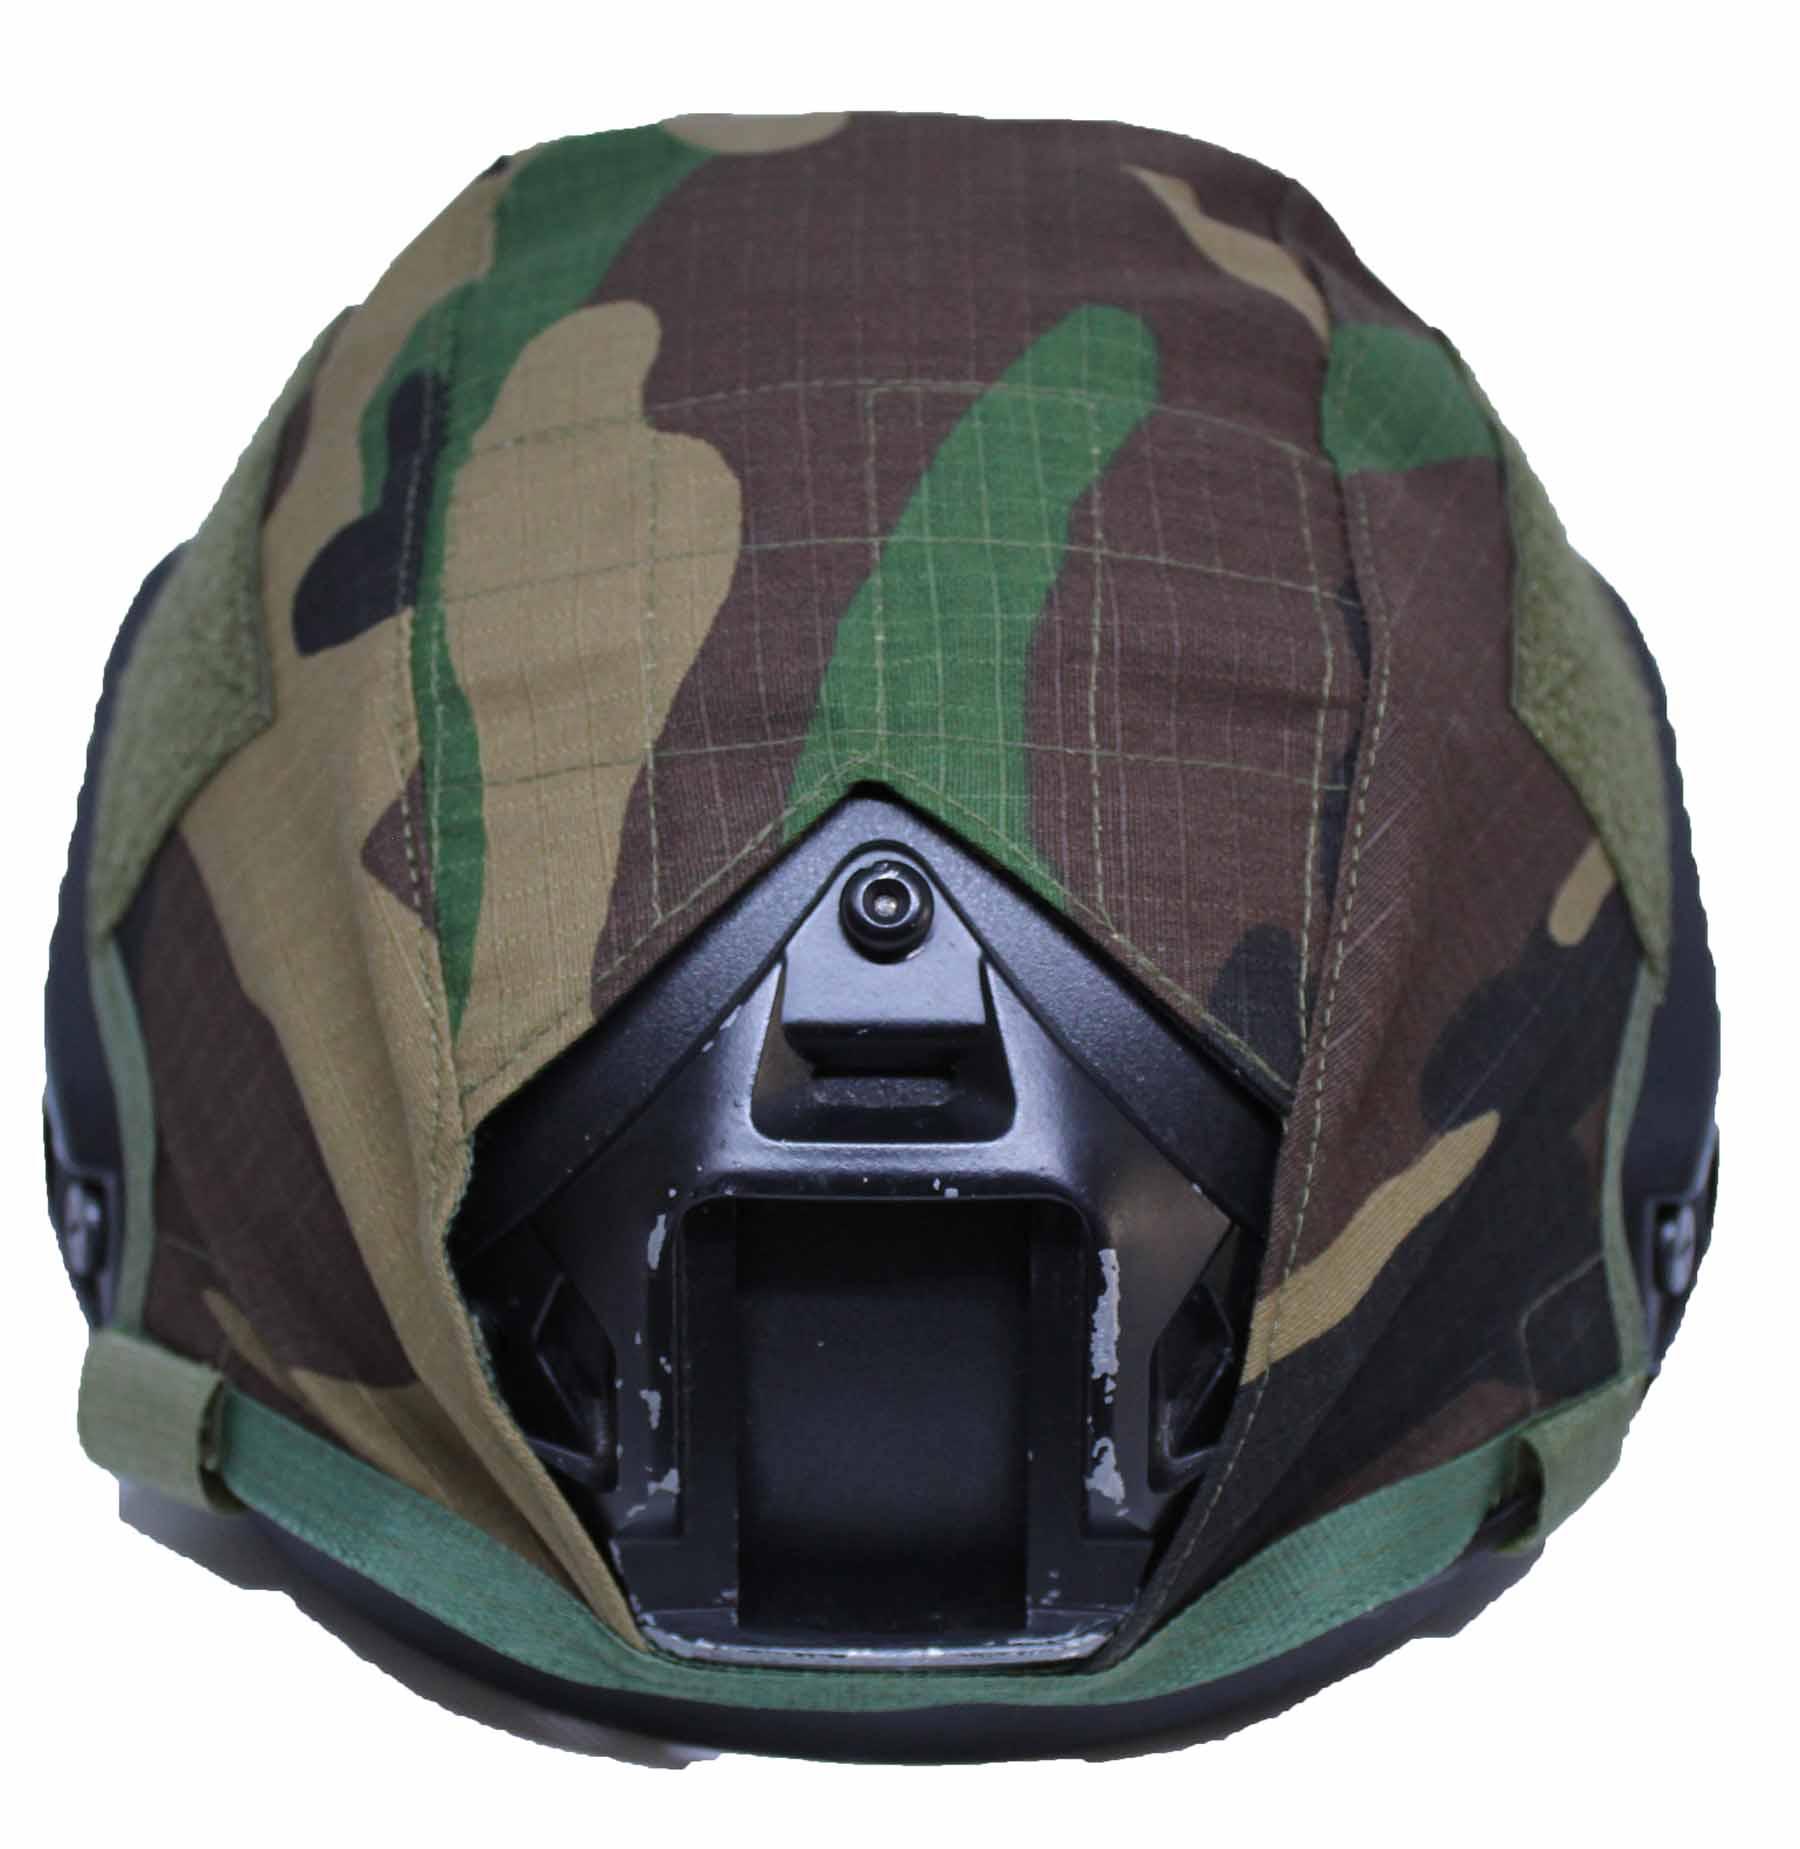 Capa para capacete Emerson